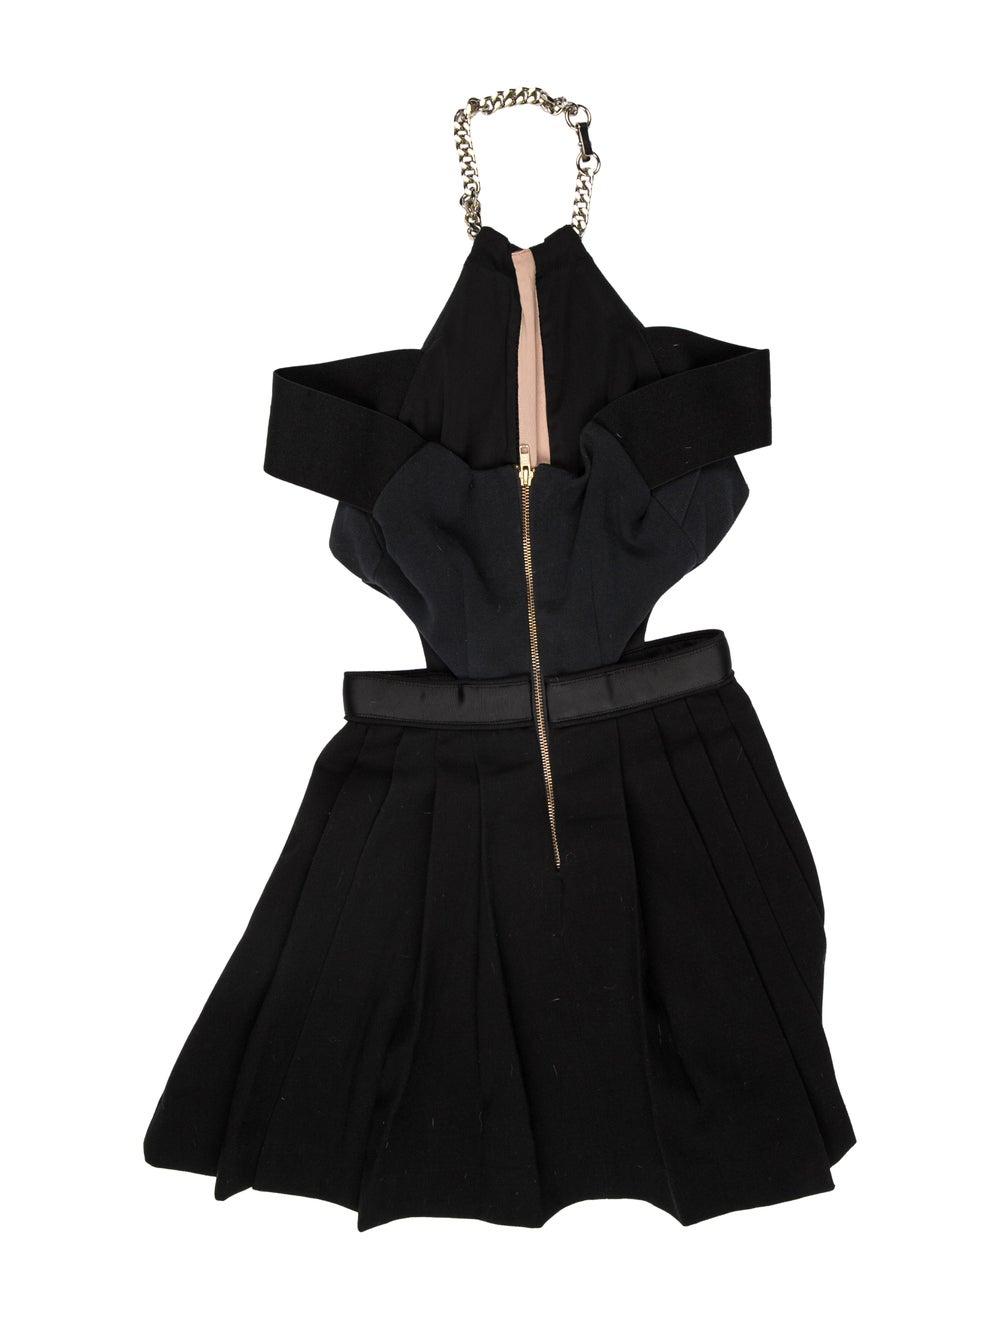 Self-Portrait Halterneck Mini Dress Black - image 2